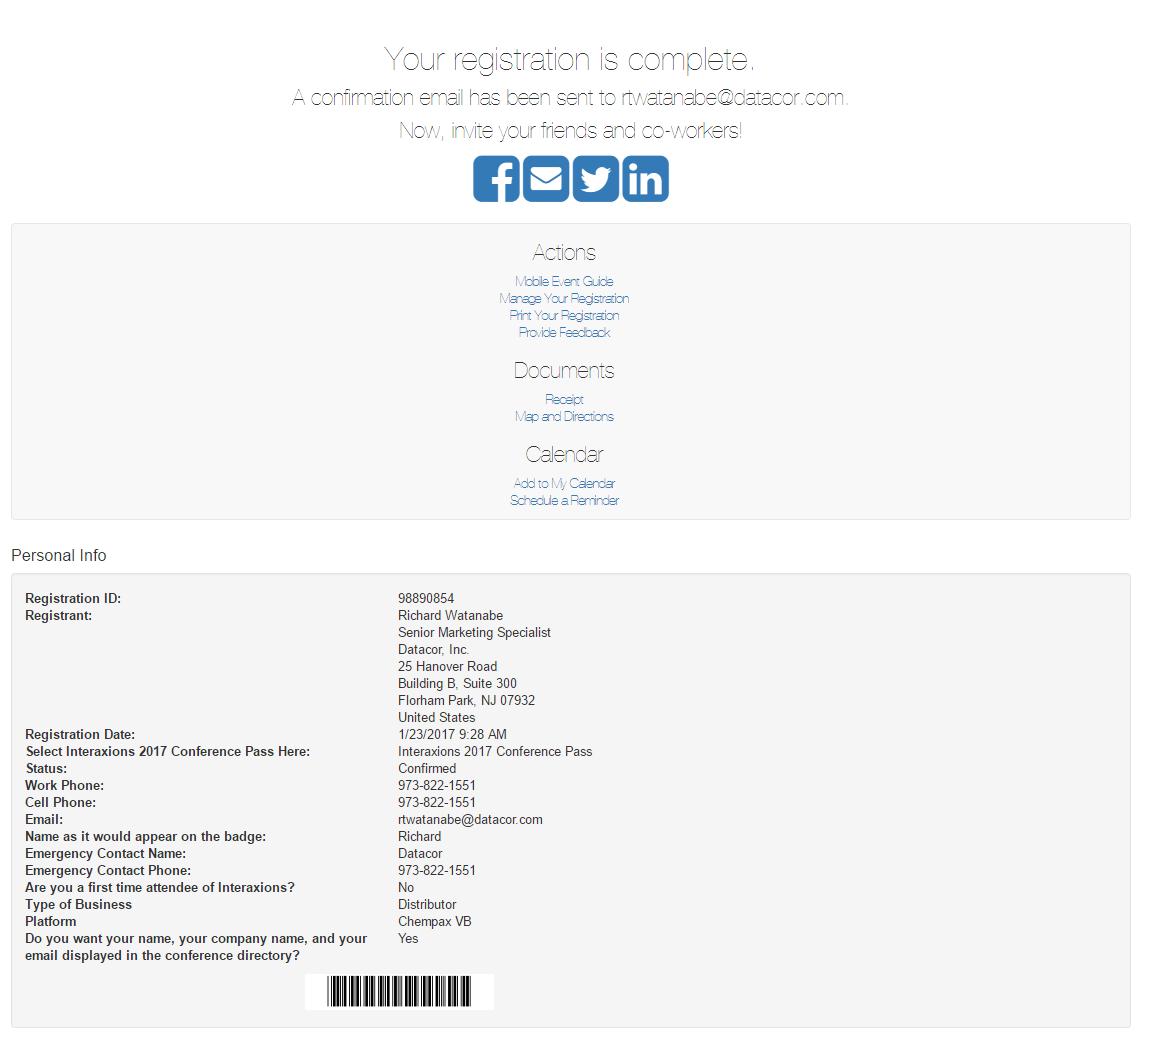 Interaxions 2017 Registration Confirmation